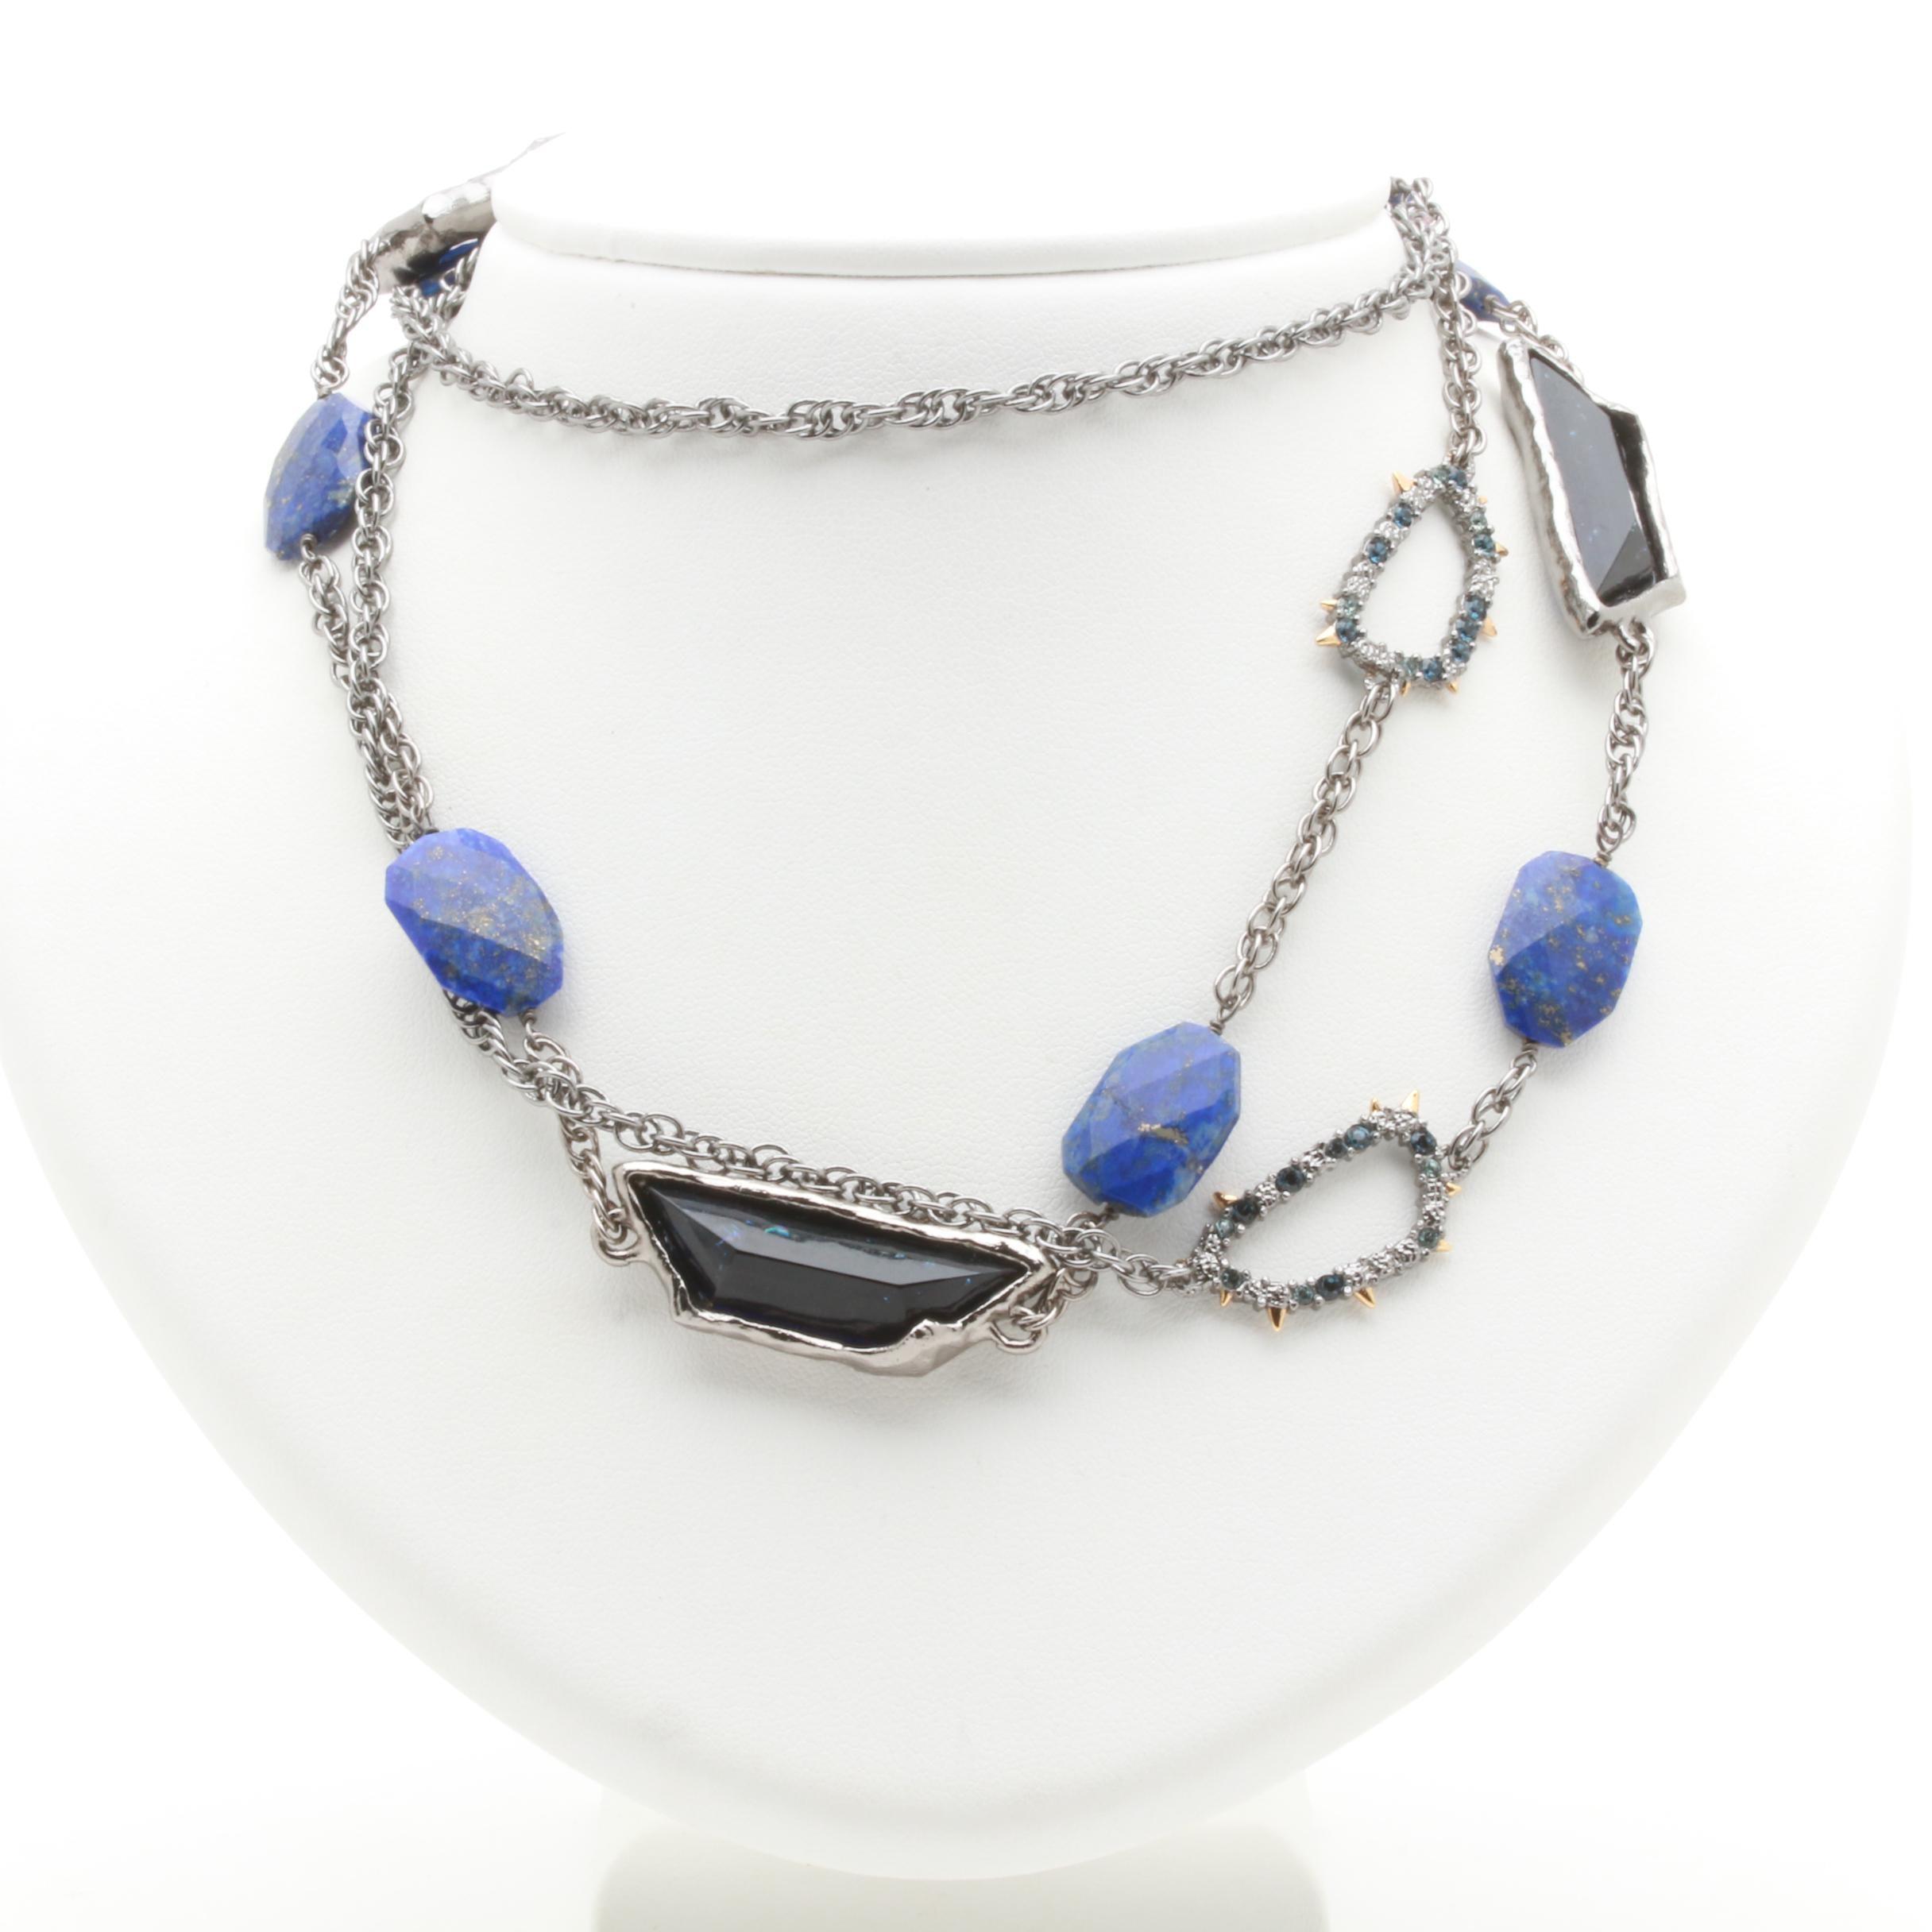 Alexis Bittar Gunmetal Tone Lapis Lazuli and Glass Necklace